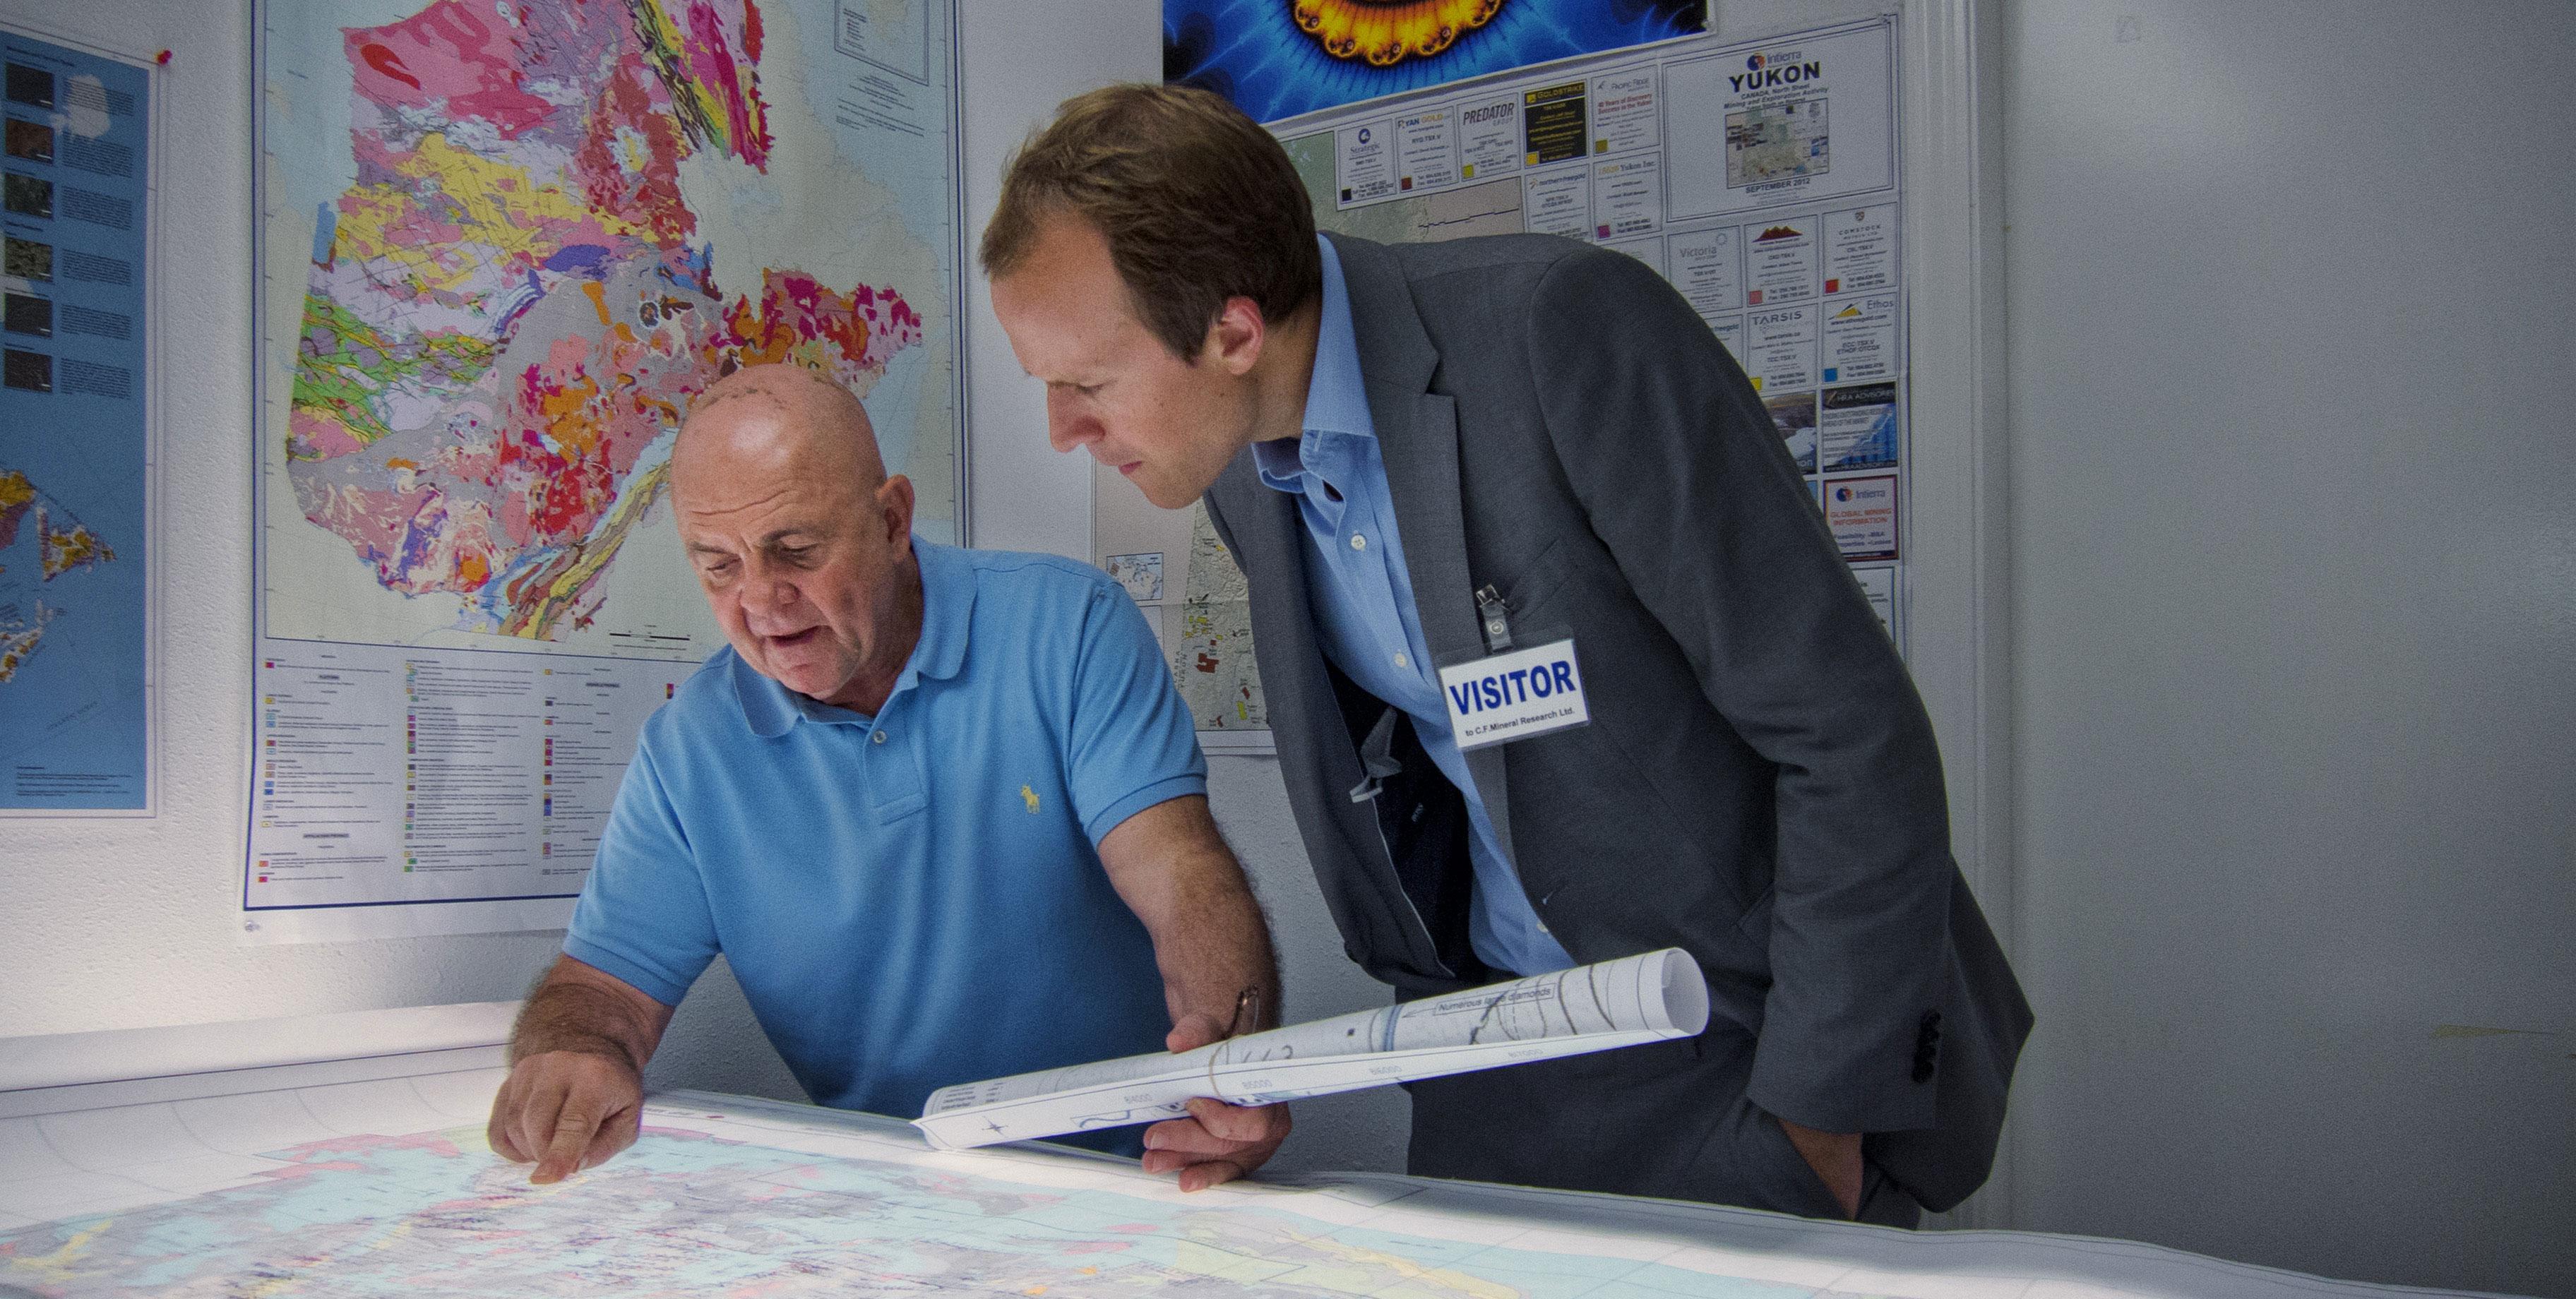 Charles Fipke, left, with Fipke Professor in Alzheimer's Research Haakon Nygaard. Photo: Brian Kladko